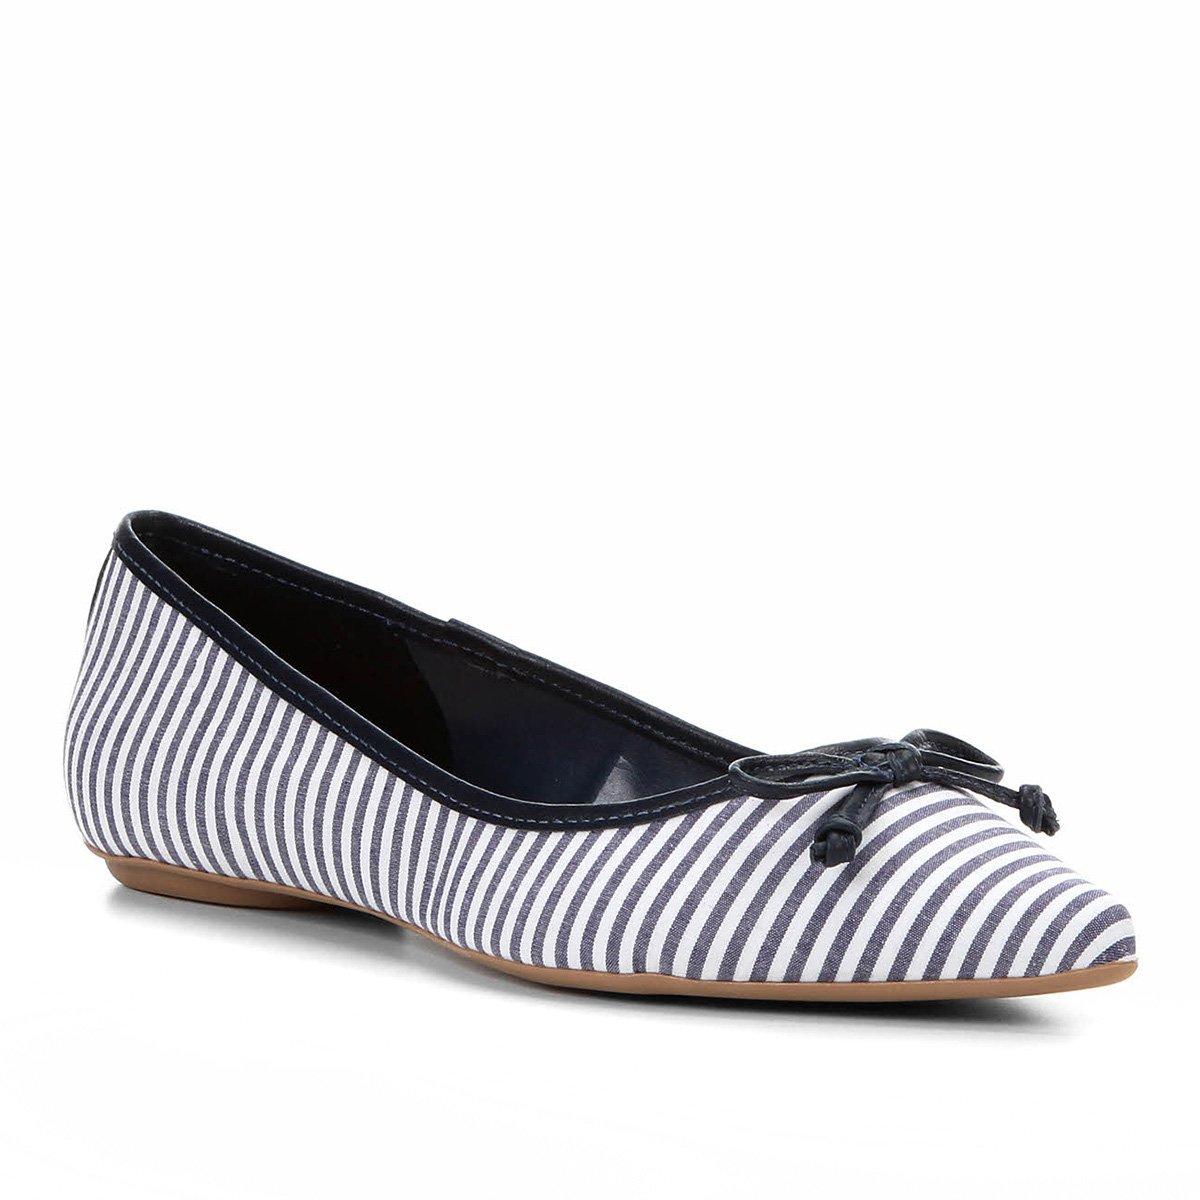 84183bb97 Sapatilha Shoestock Bico Fino Laço Feminina